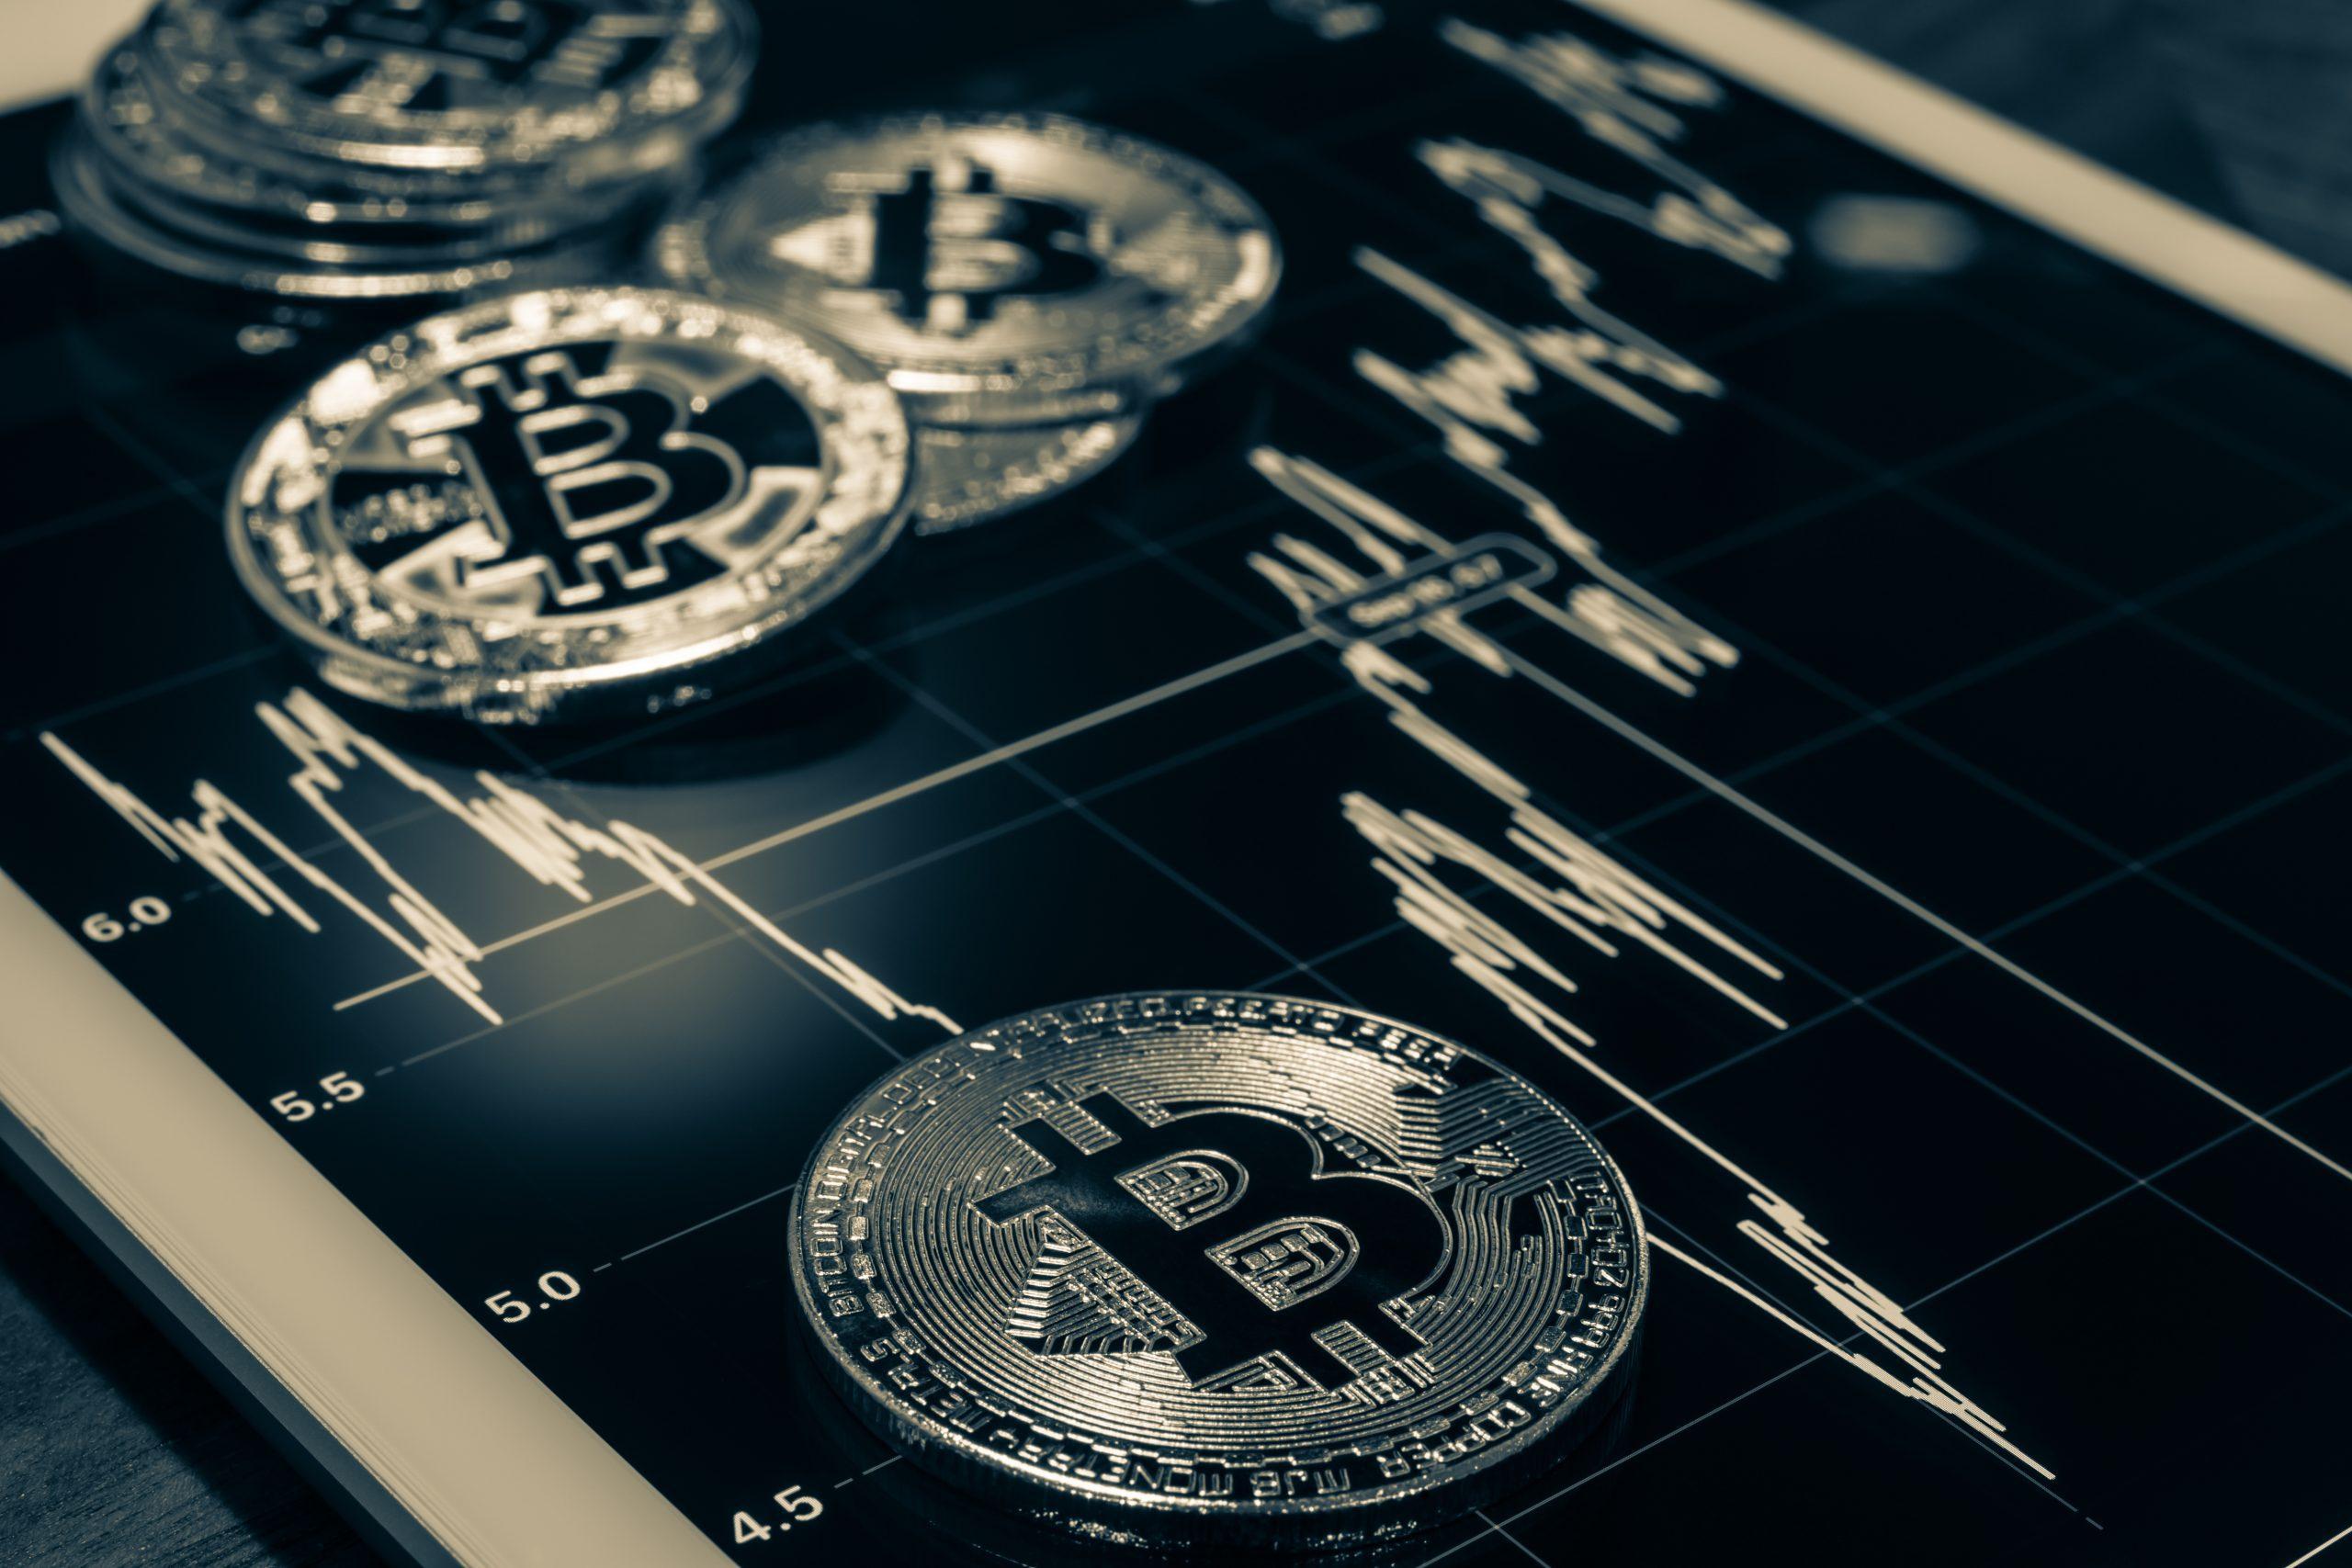 BIT Capital etabliert zwei neue Krypto-Fonds | BTC-ECHO